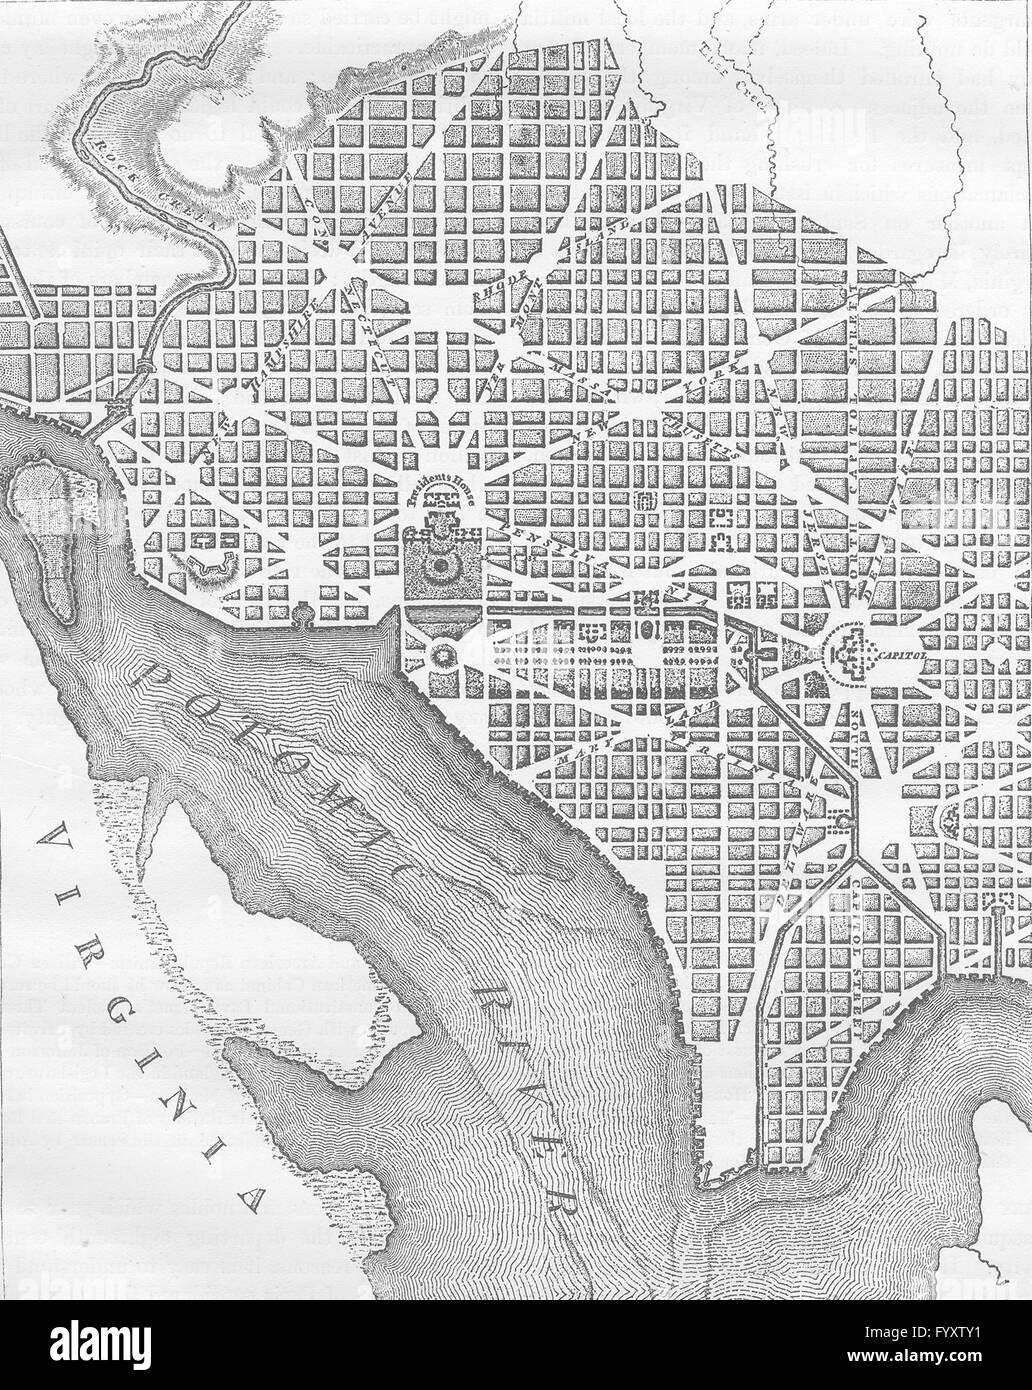 WASHINGTON DC City Plan original layout 1793 c1880 antique map